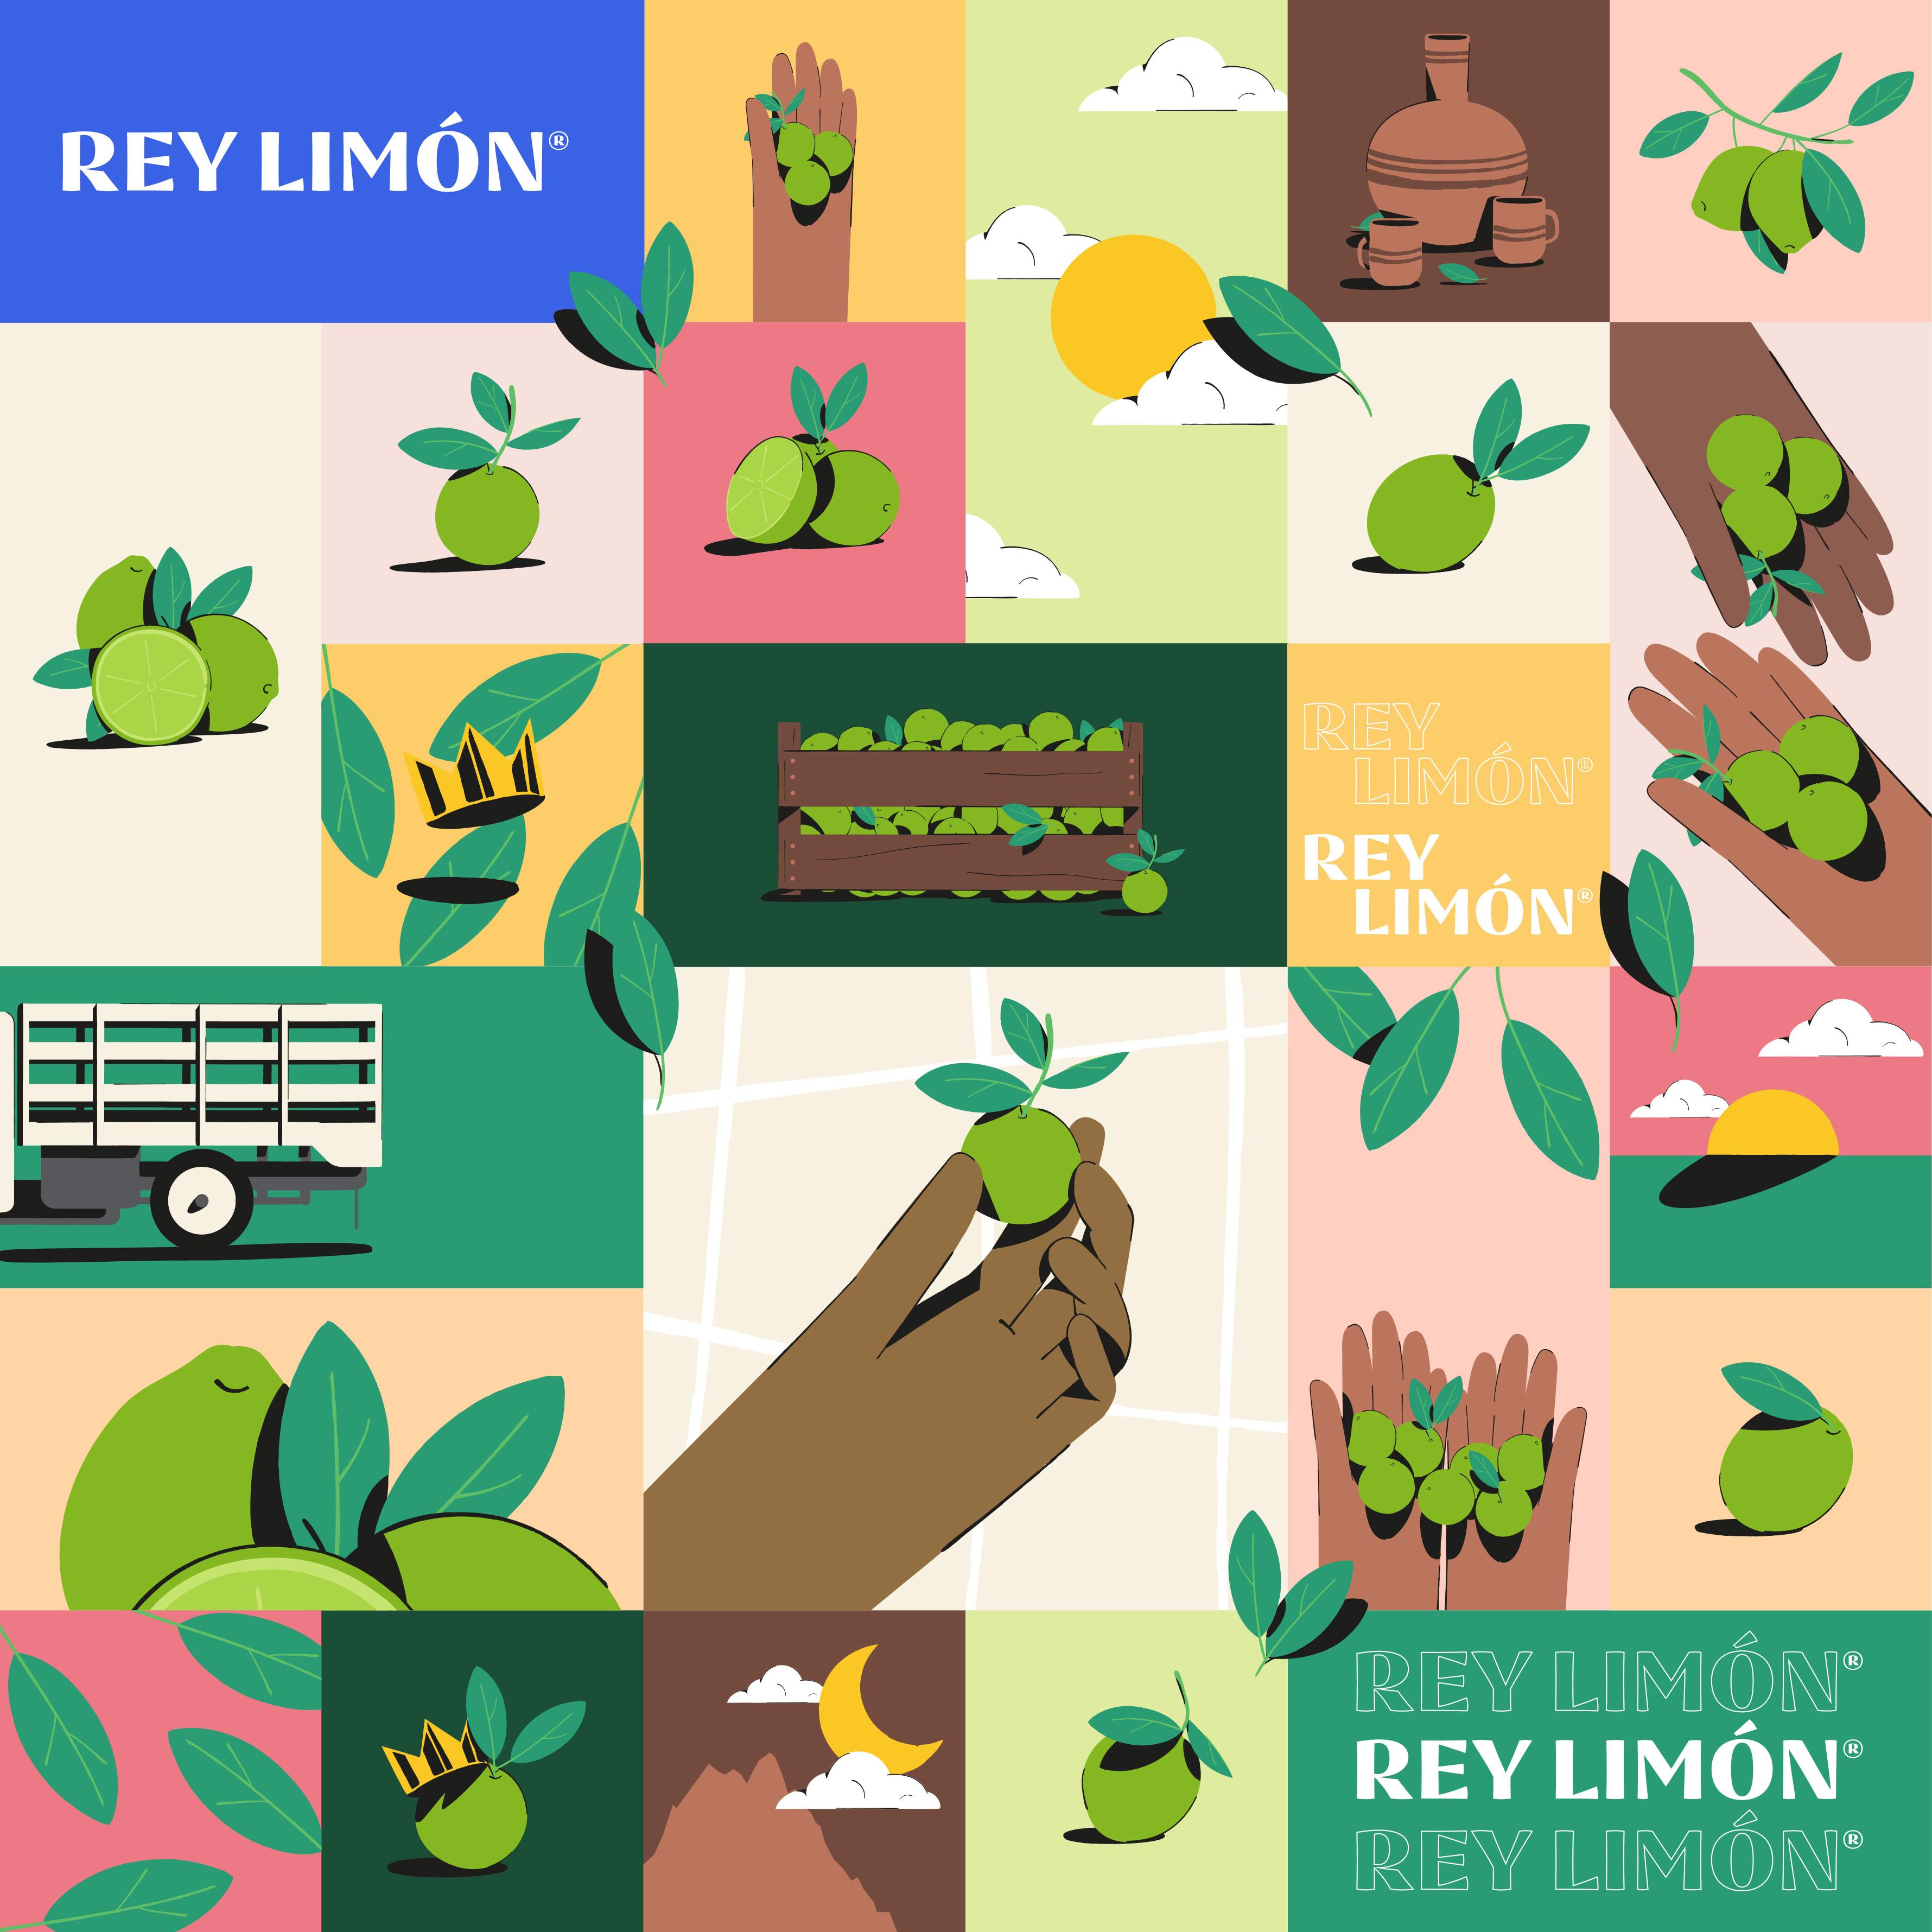 Rey-Limon-016